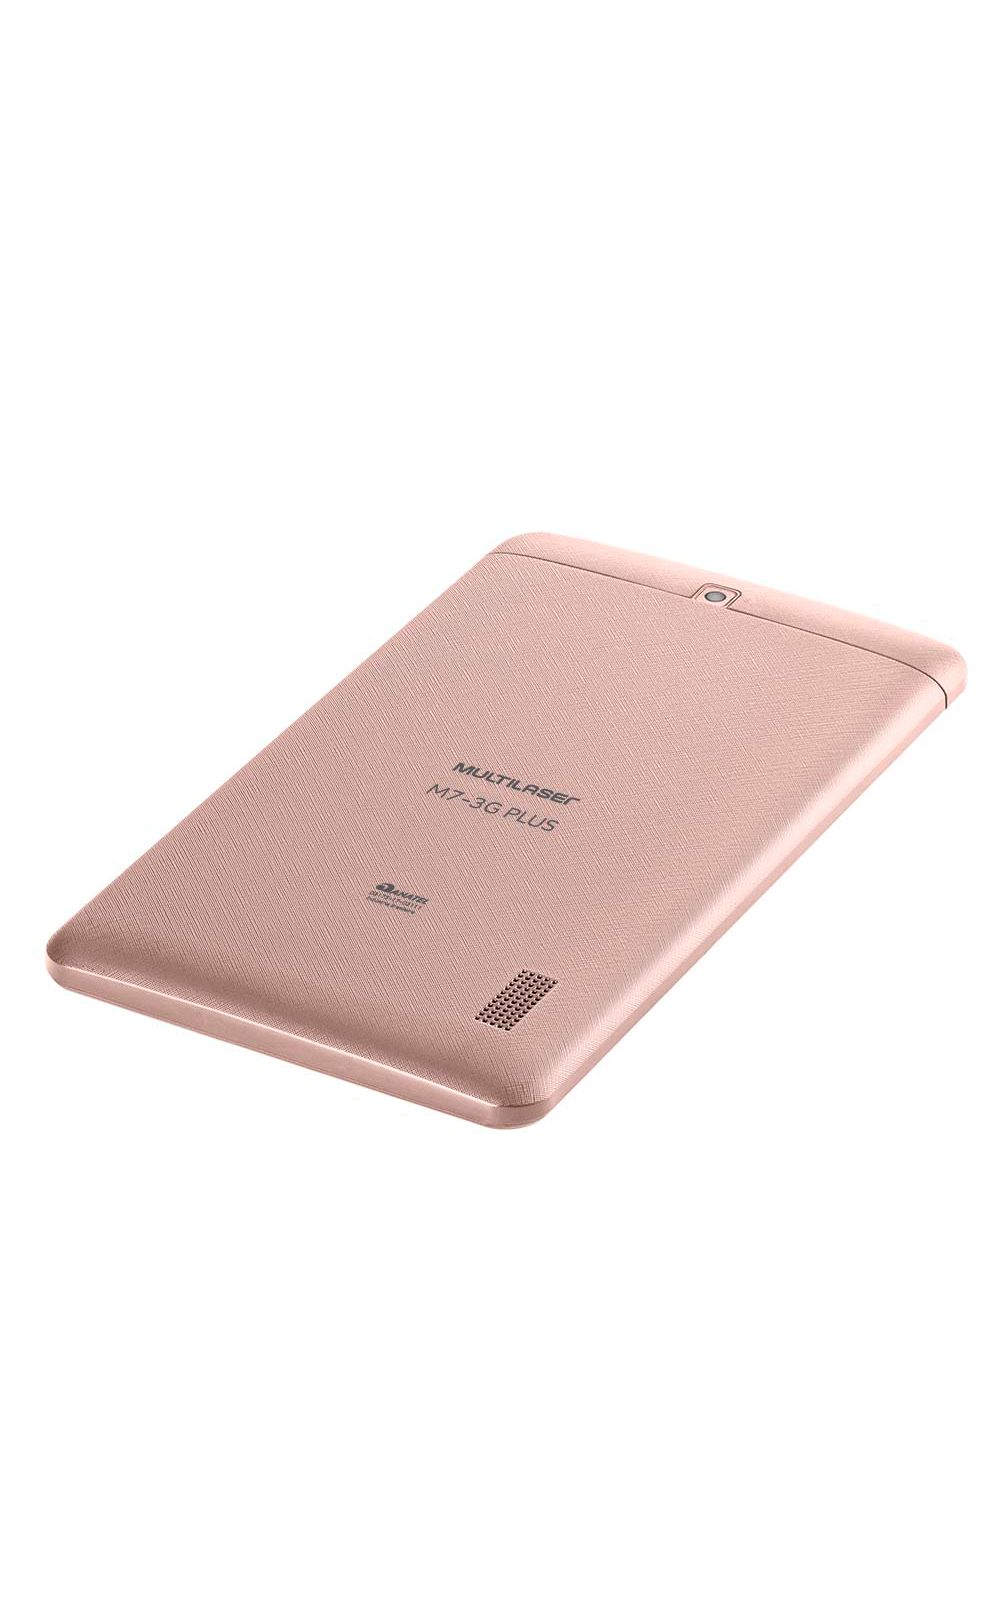 Foto 5 - Tablet Multilaser M7 3G Plus Dual Chip Quad Core 1 GB de Ram Memória 16 GB Tela 7 Polegadas Rosa - NB305